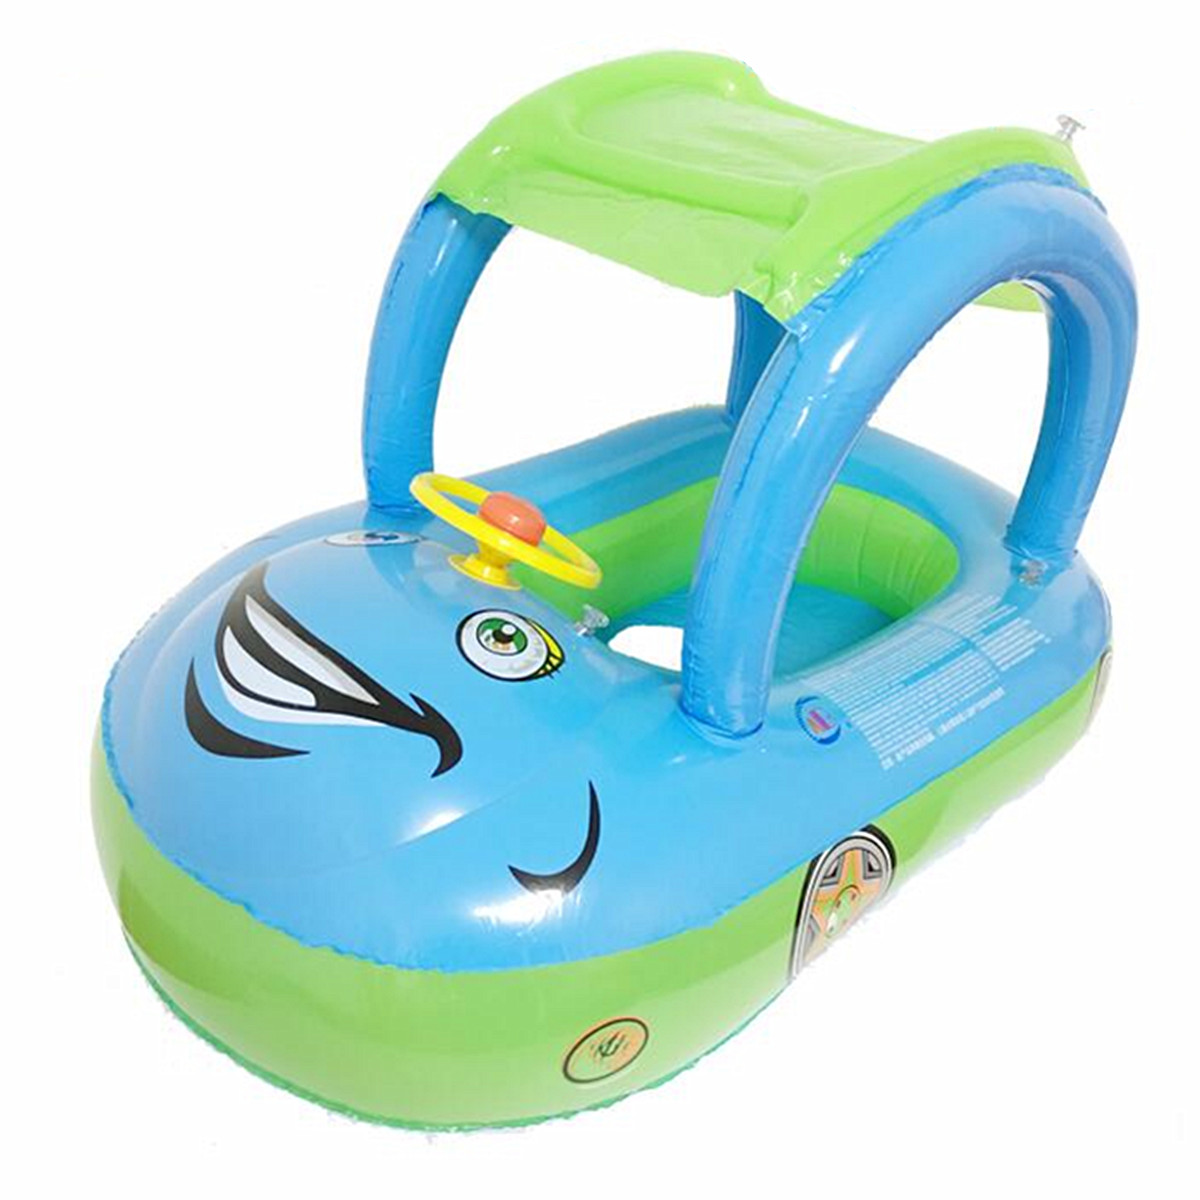 Aliexpress.com : Buy Baby Float Seat Car Sun Shade Baby Swim ...